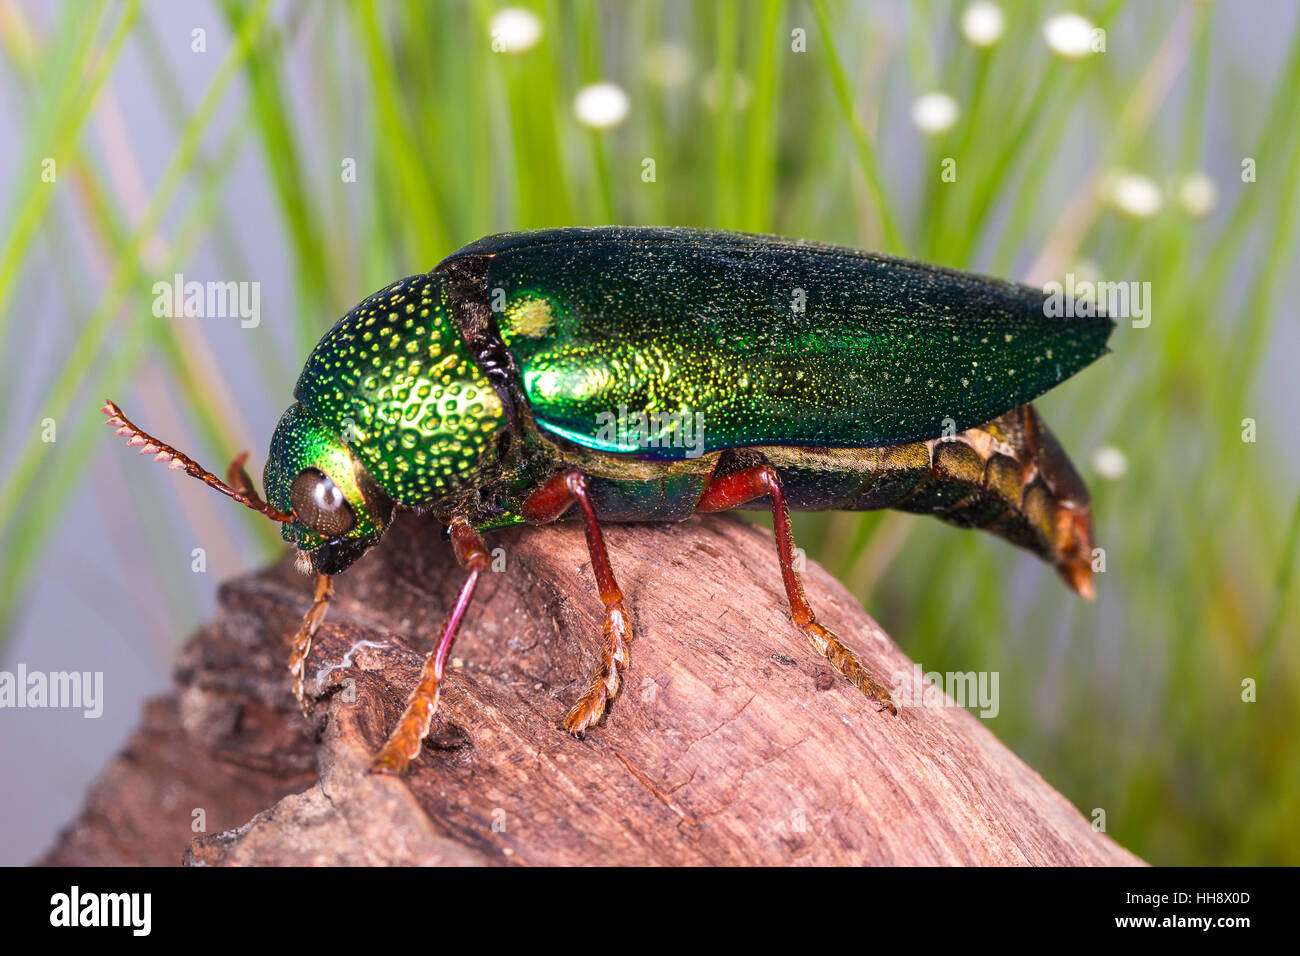 Jewel Beetle (Sternocera ruficornis) - Stock Image